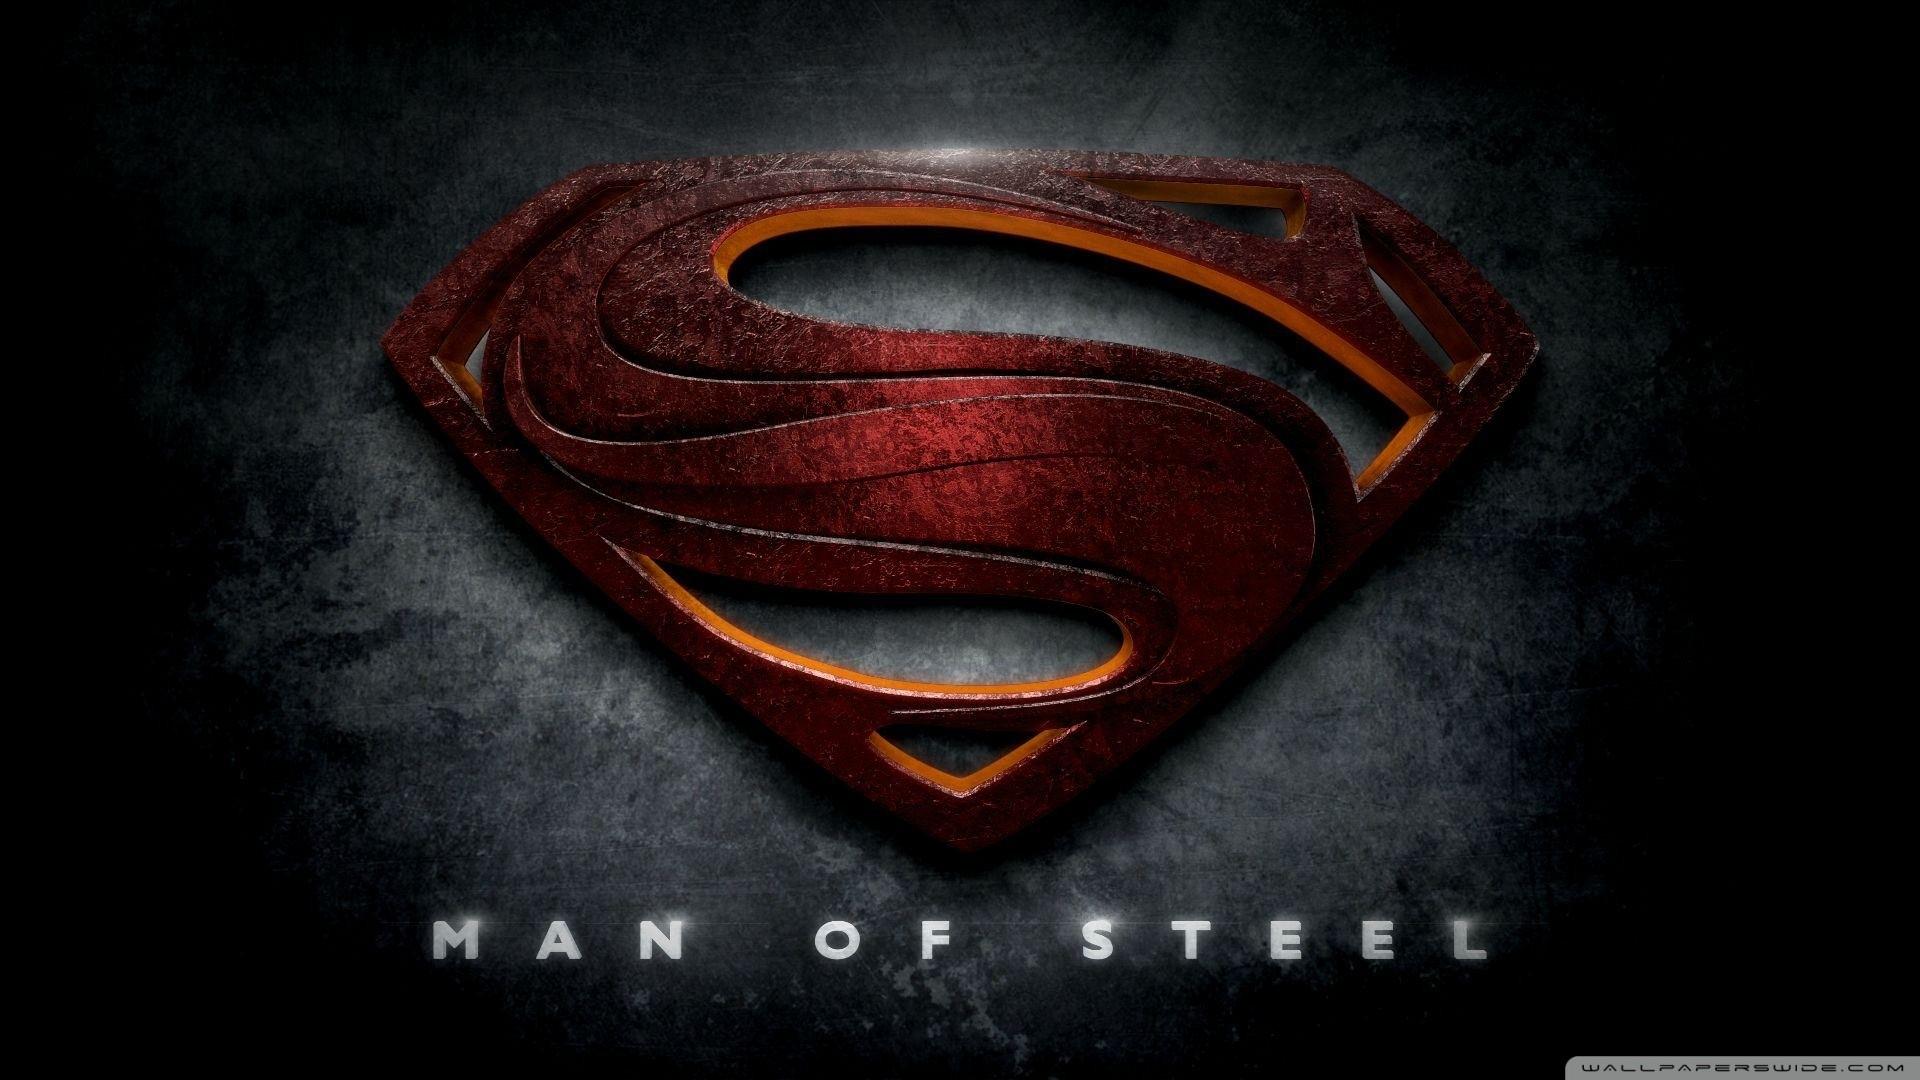 Best 25+ Superman hd wallpaper ideas on Pinterest   Superman logo, Superman  logo wallpaper and Superman logo art